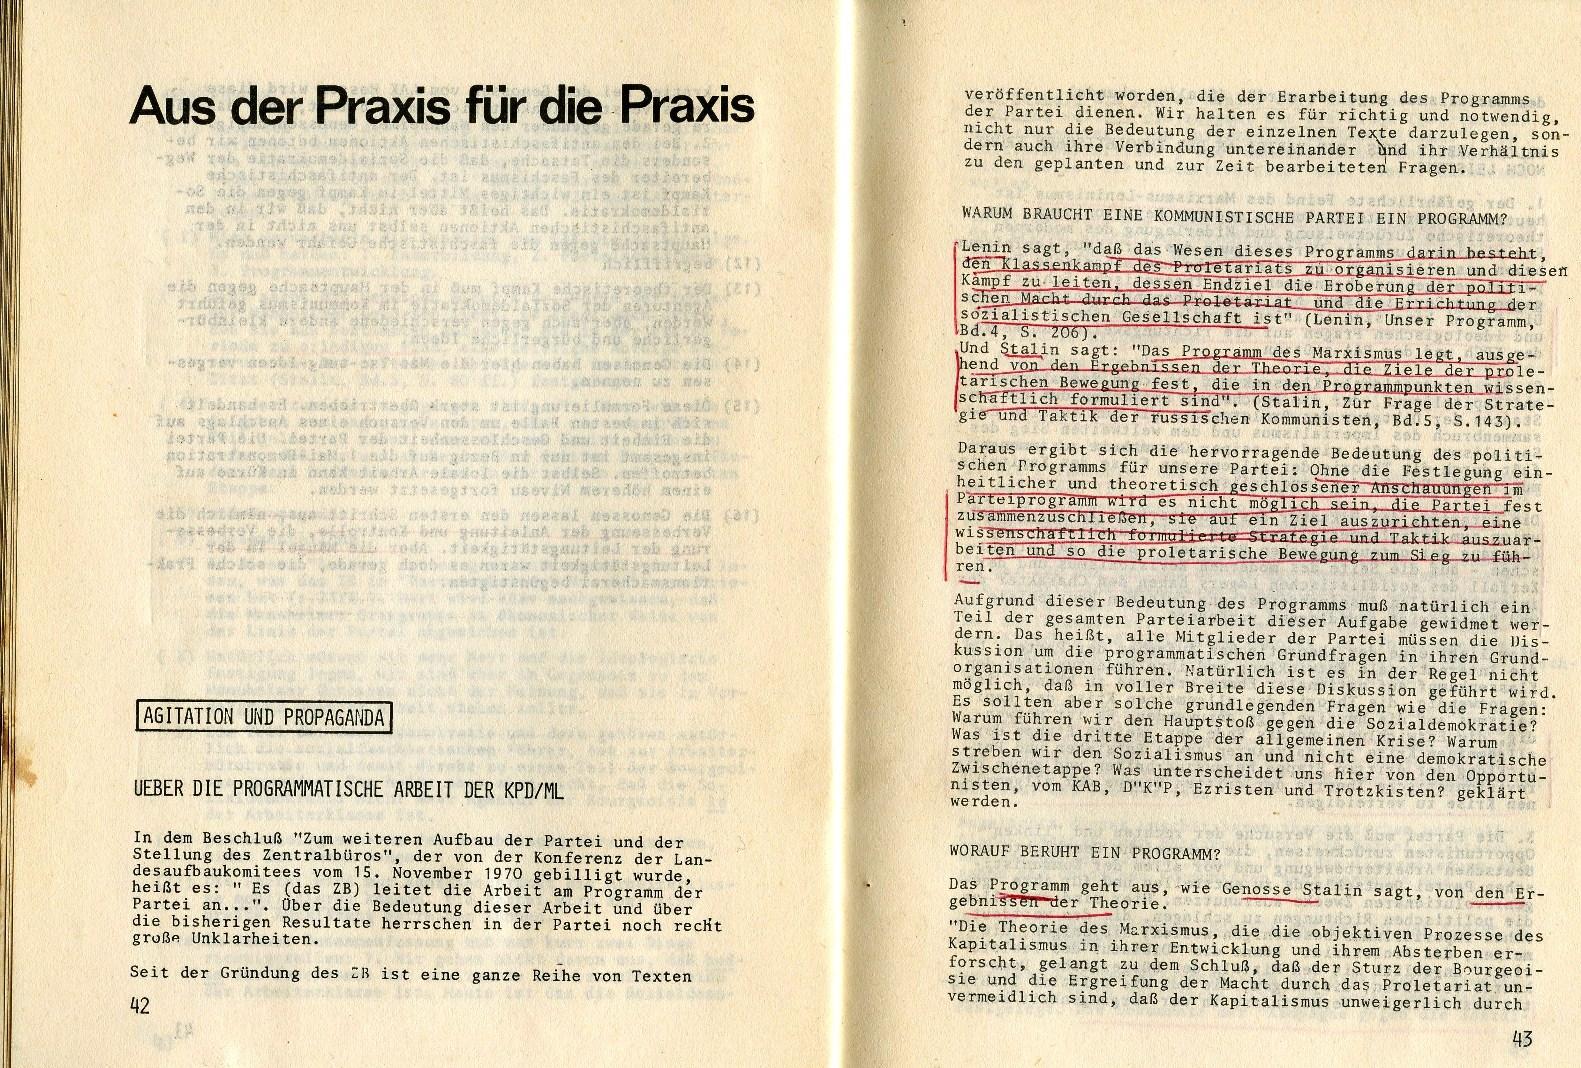 ZB_Parteiarbeiter_1971_05_23